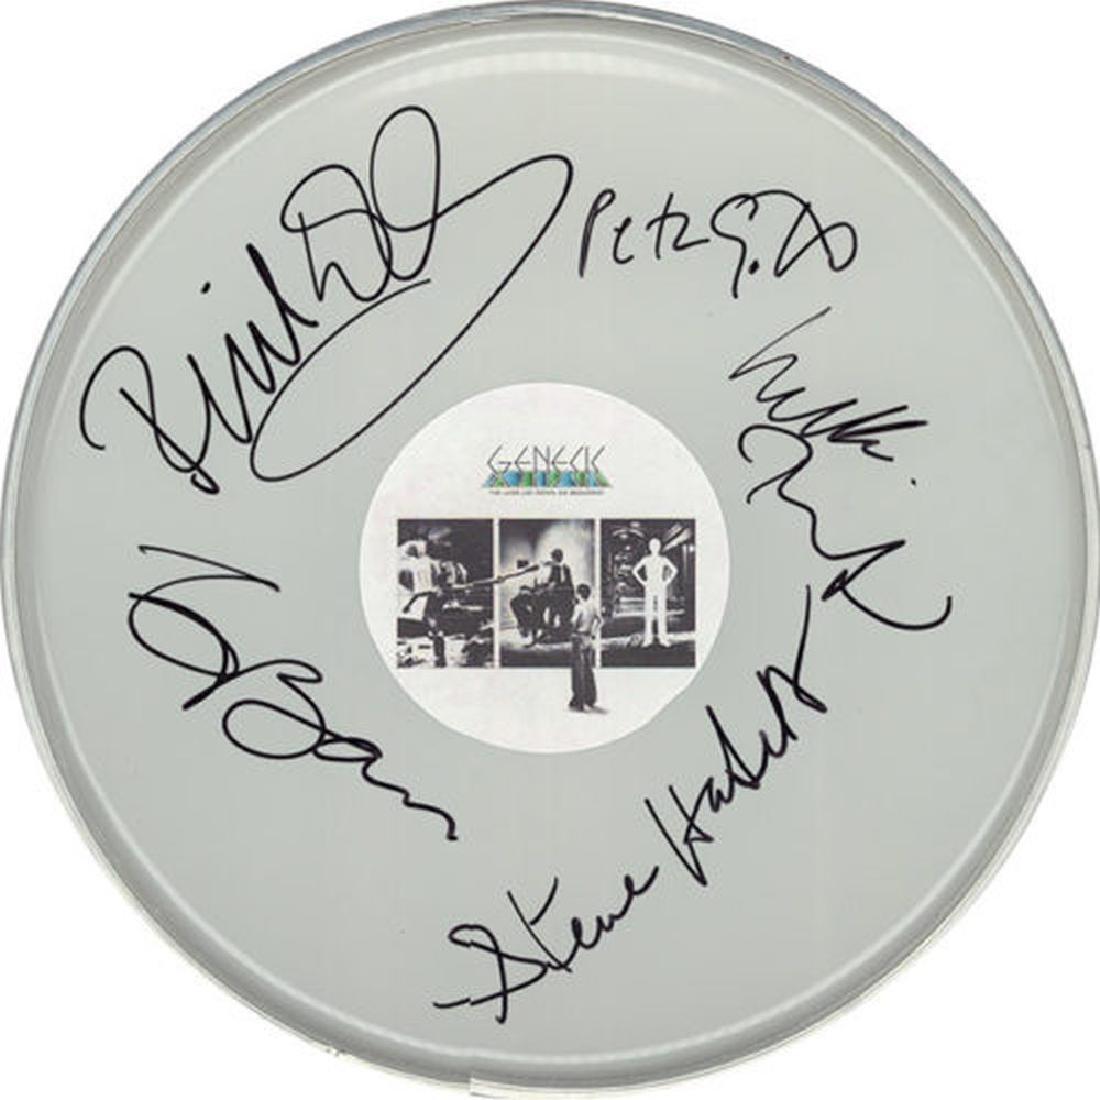 Genesis Band Signed Drum Head